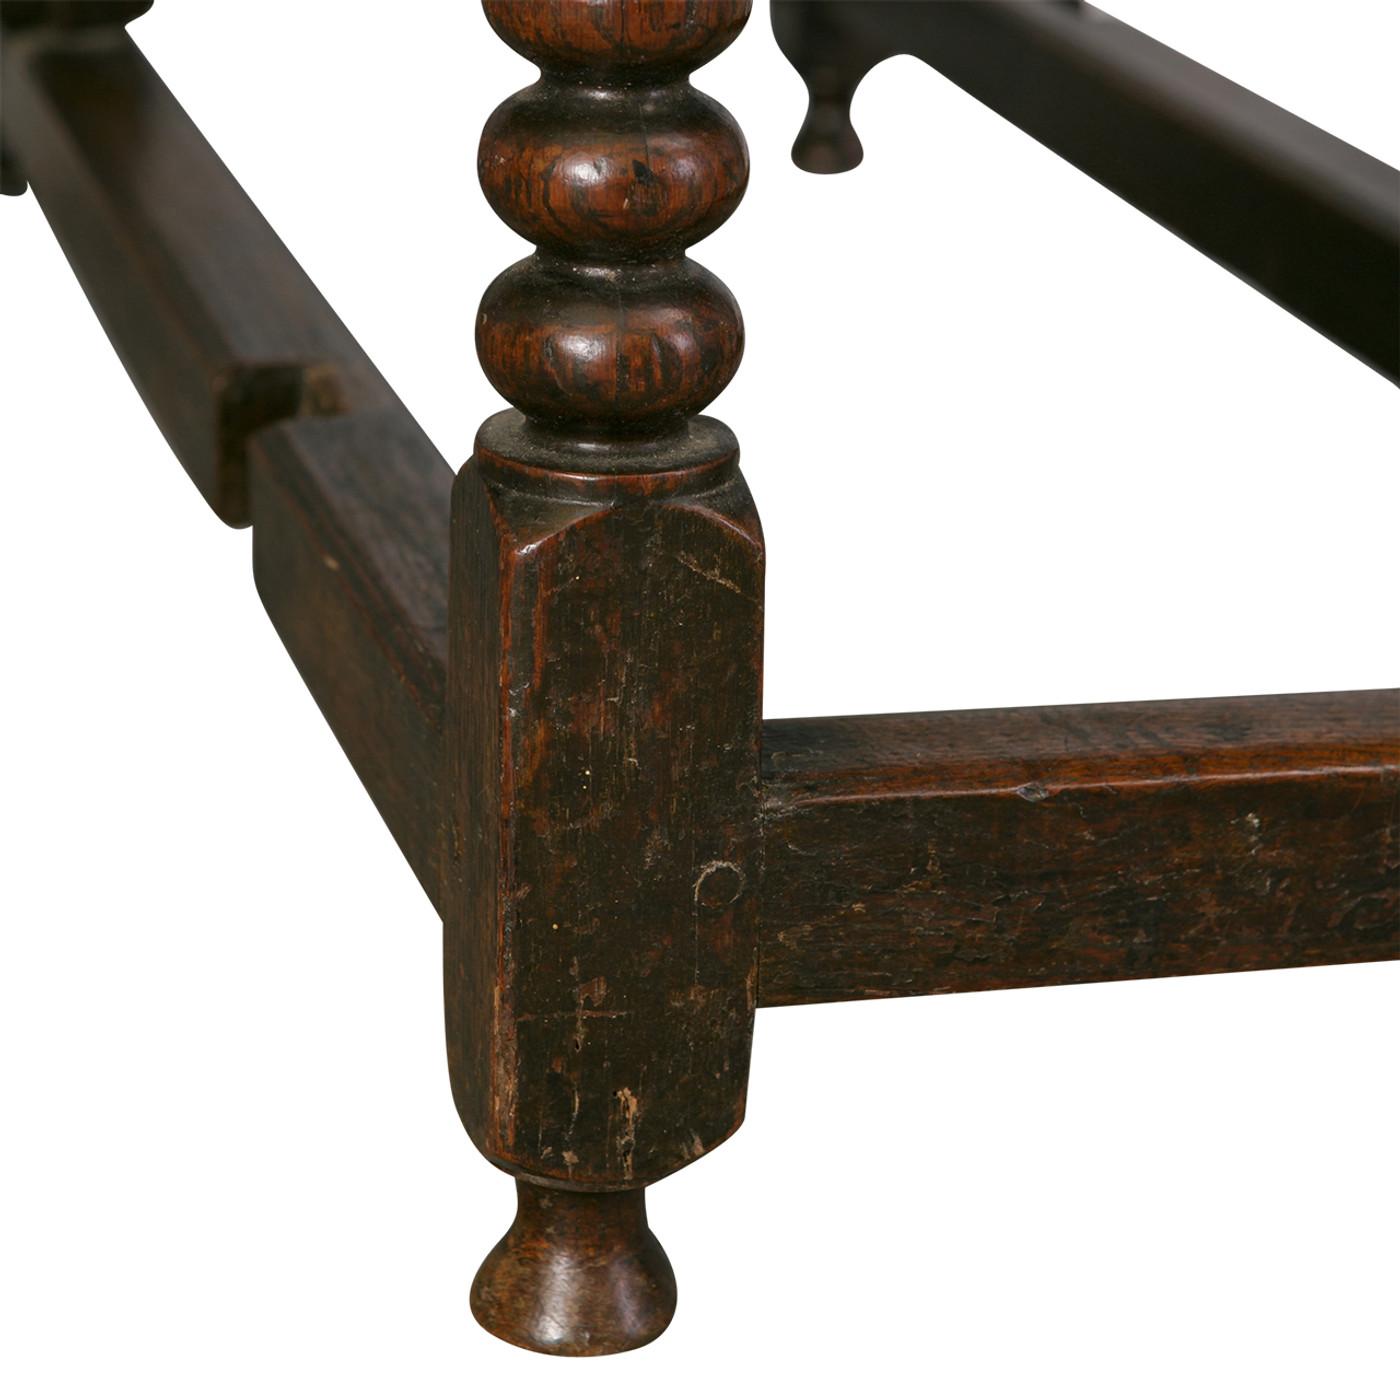 English Gateleg Table, Late 18th c.